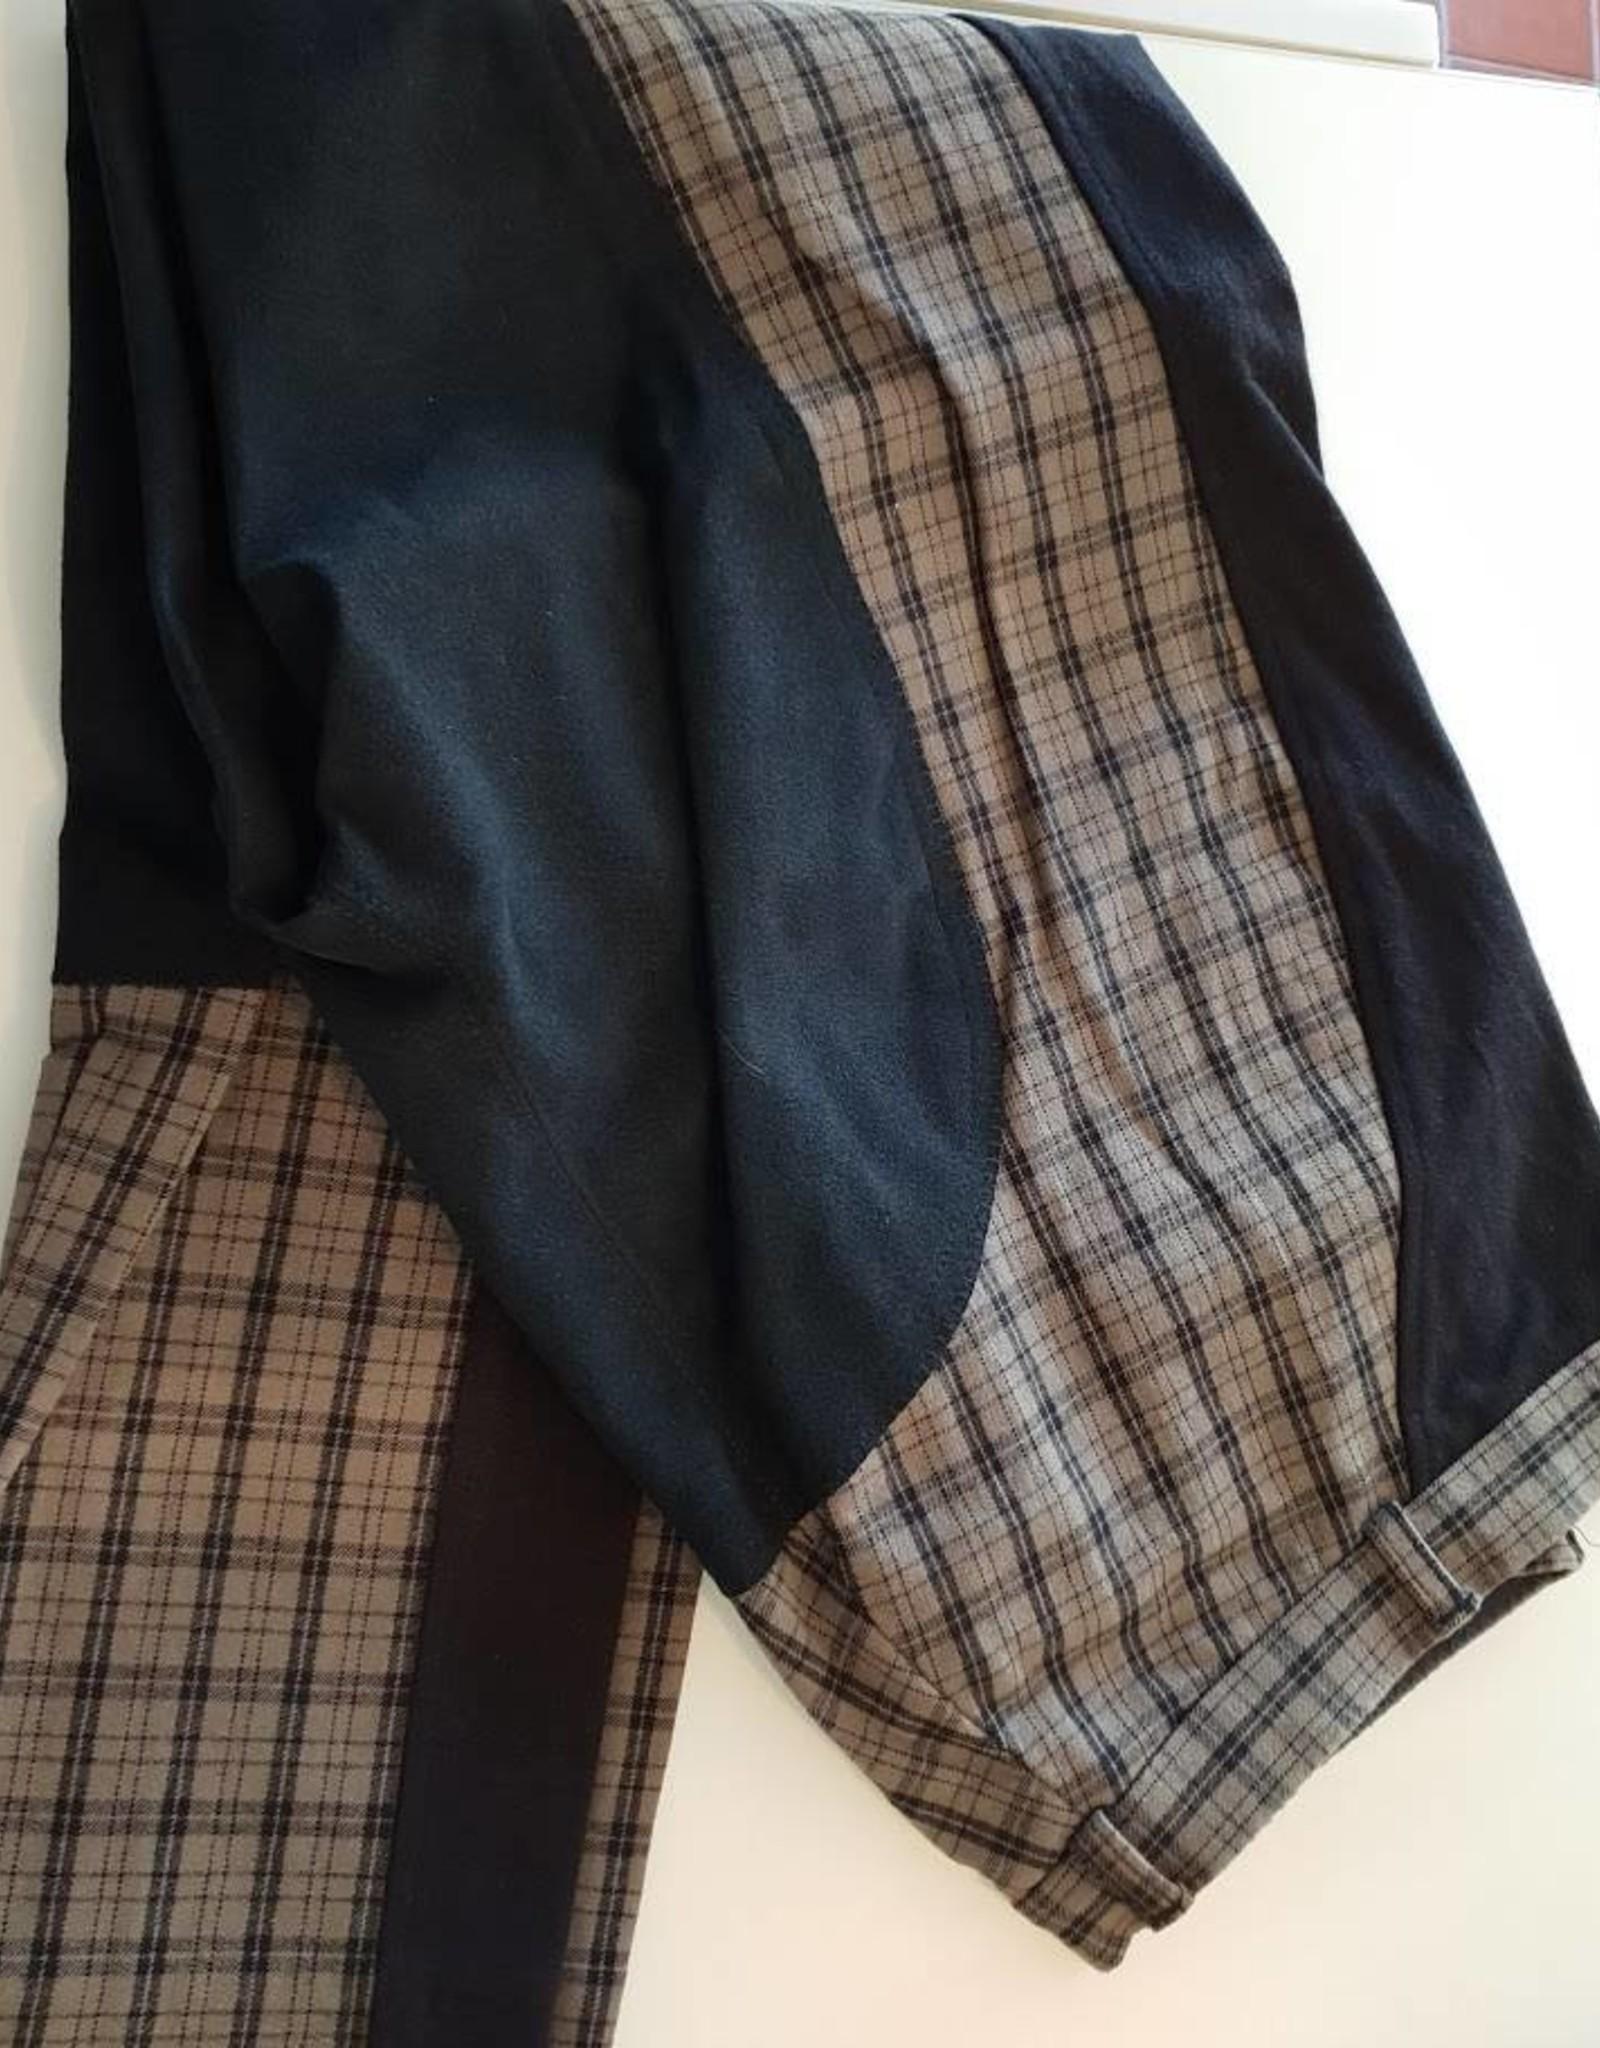 Thomas Cook Thomas Cook Splice Check Jodhpur - Brown/Black - Size16